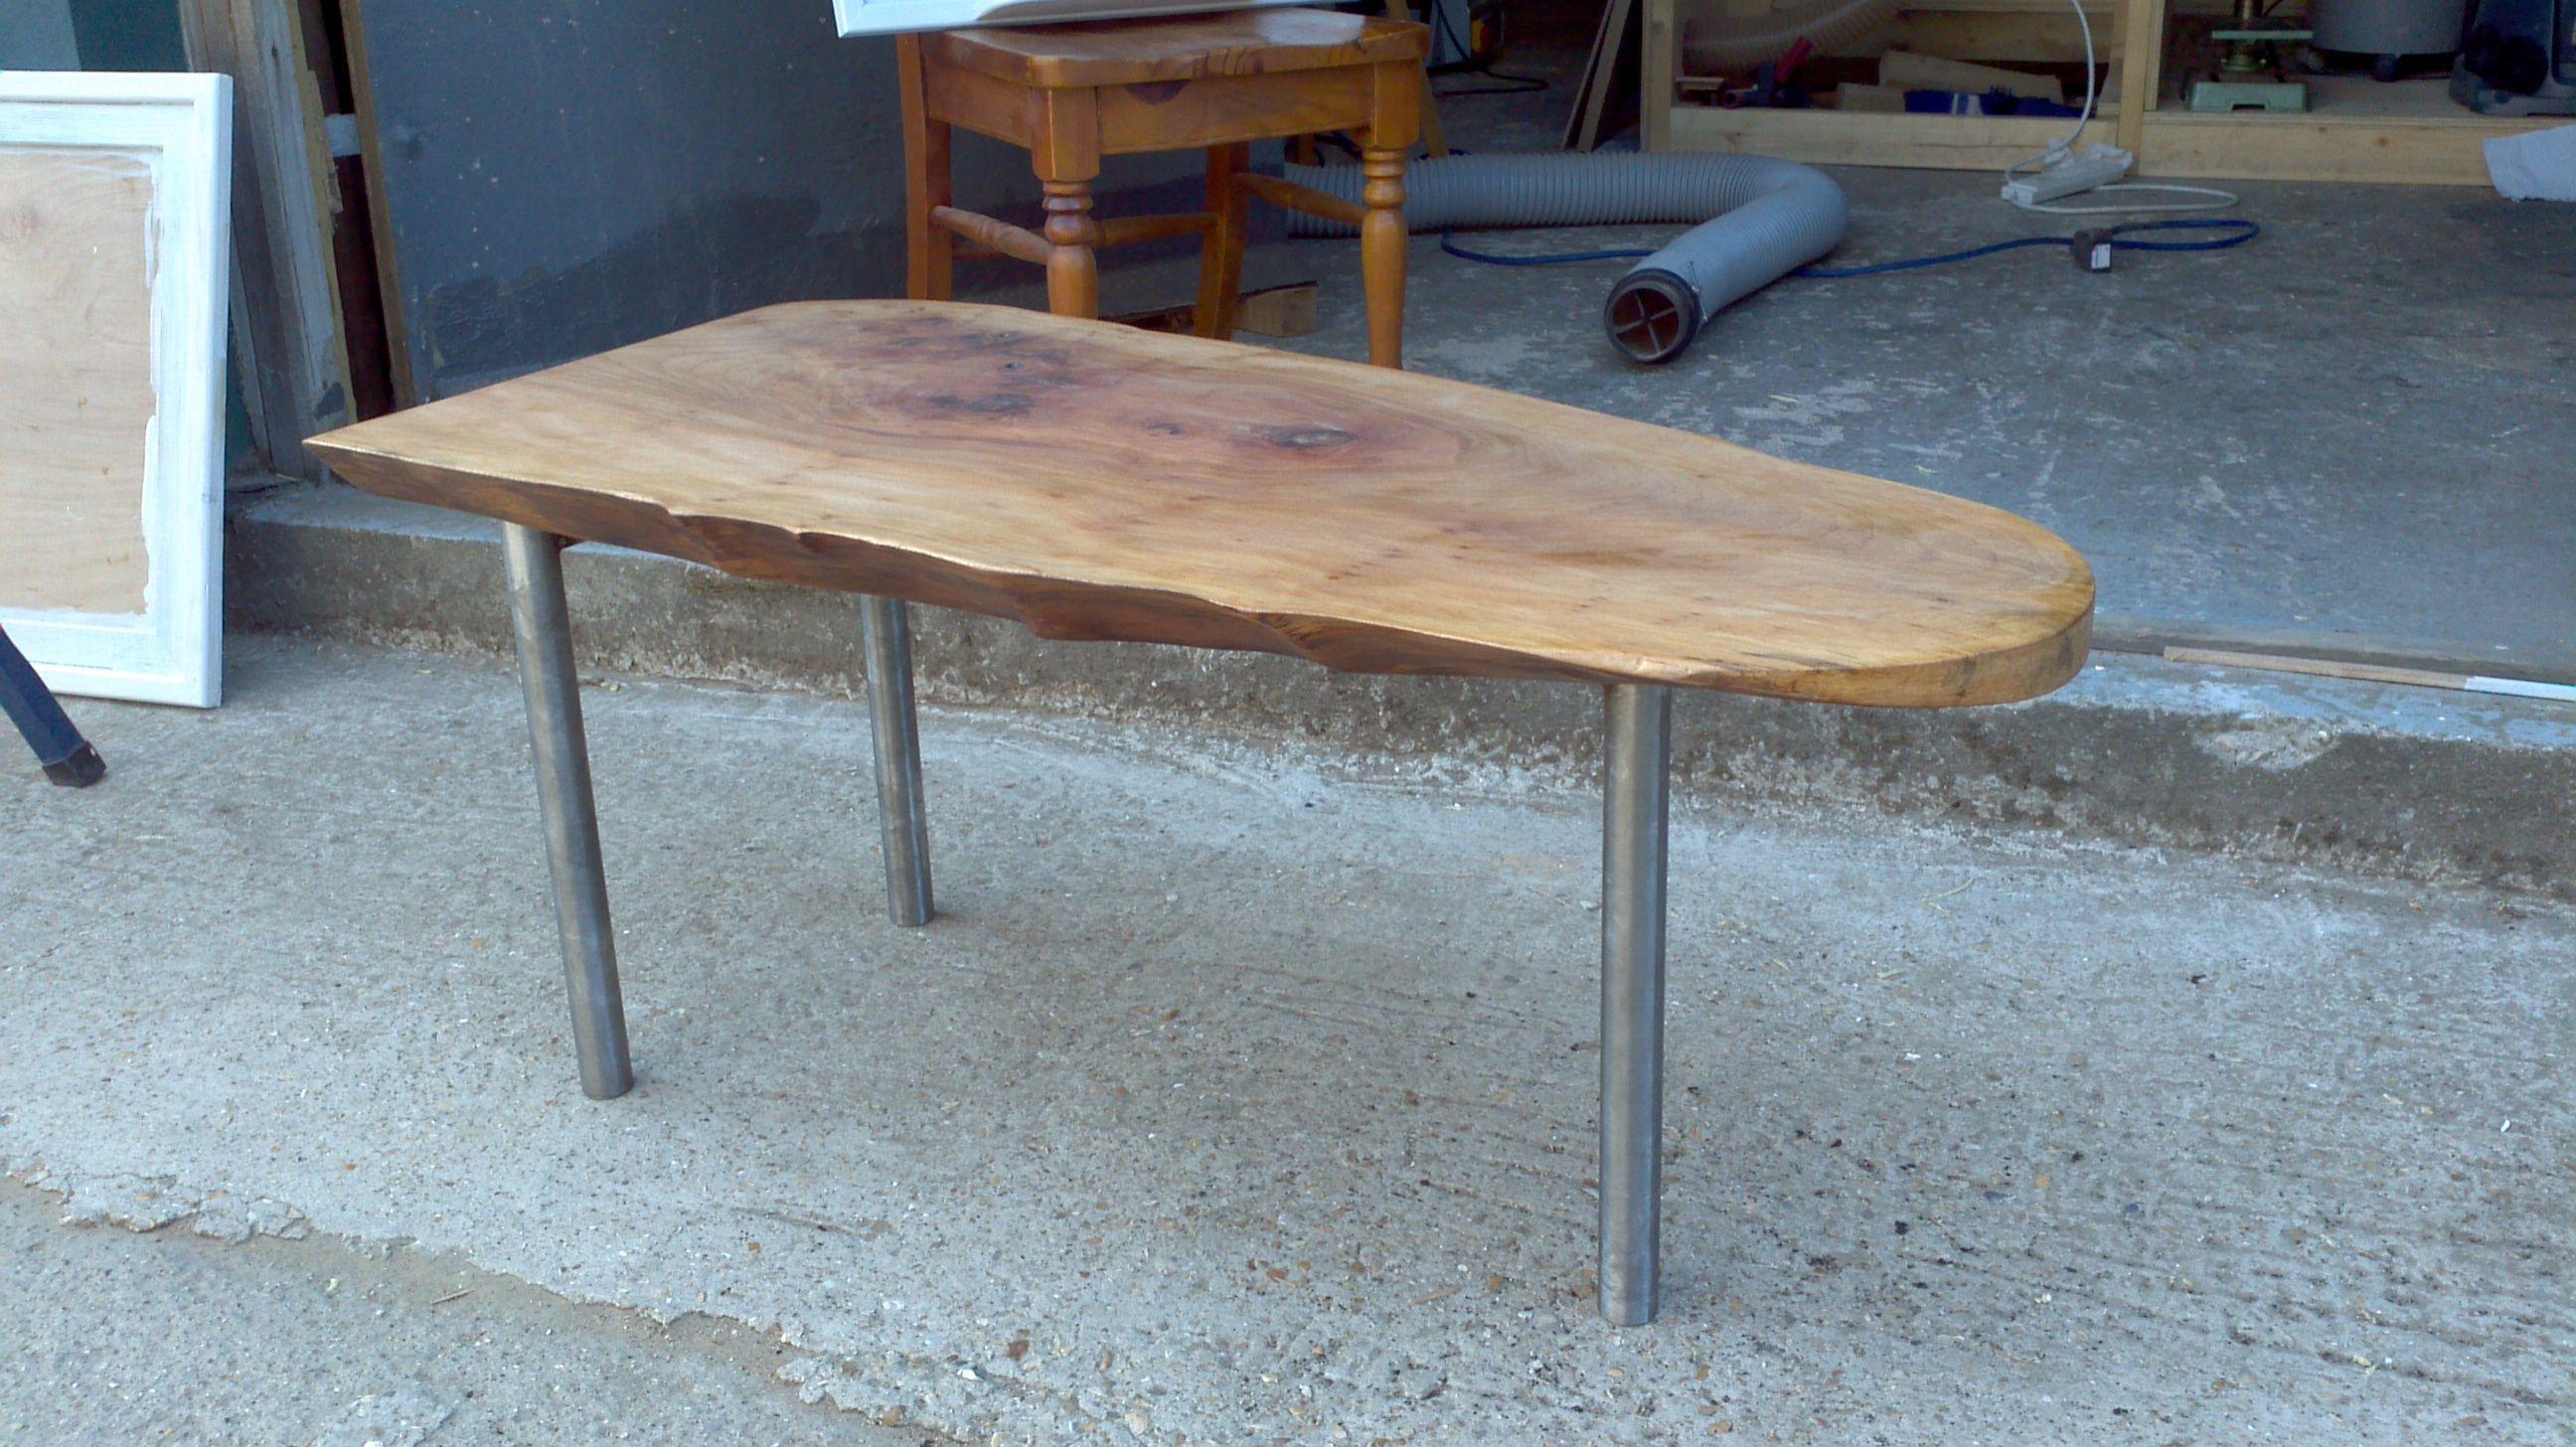 U0027Slabu0027 Coffee Table Made From Solid Cherry Mounted On Steel Tube Legs.